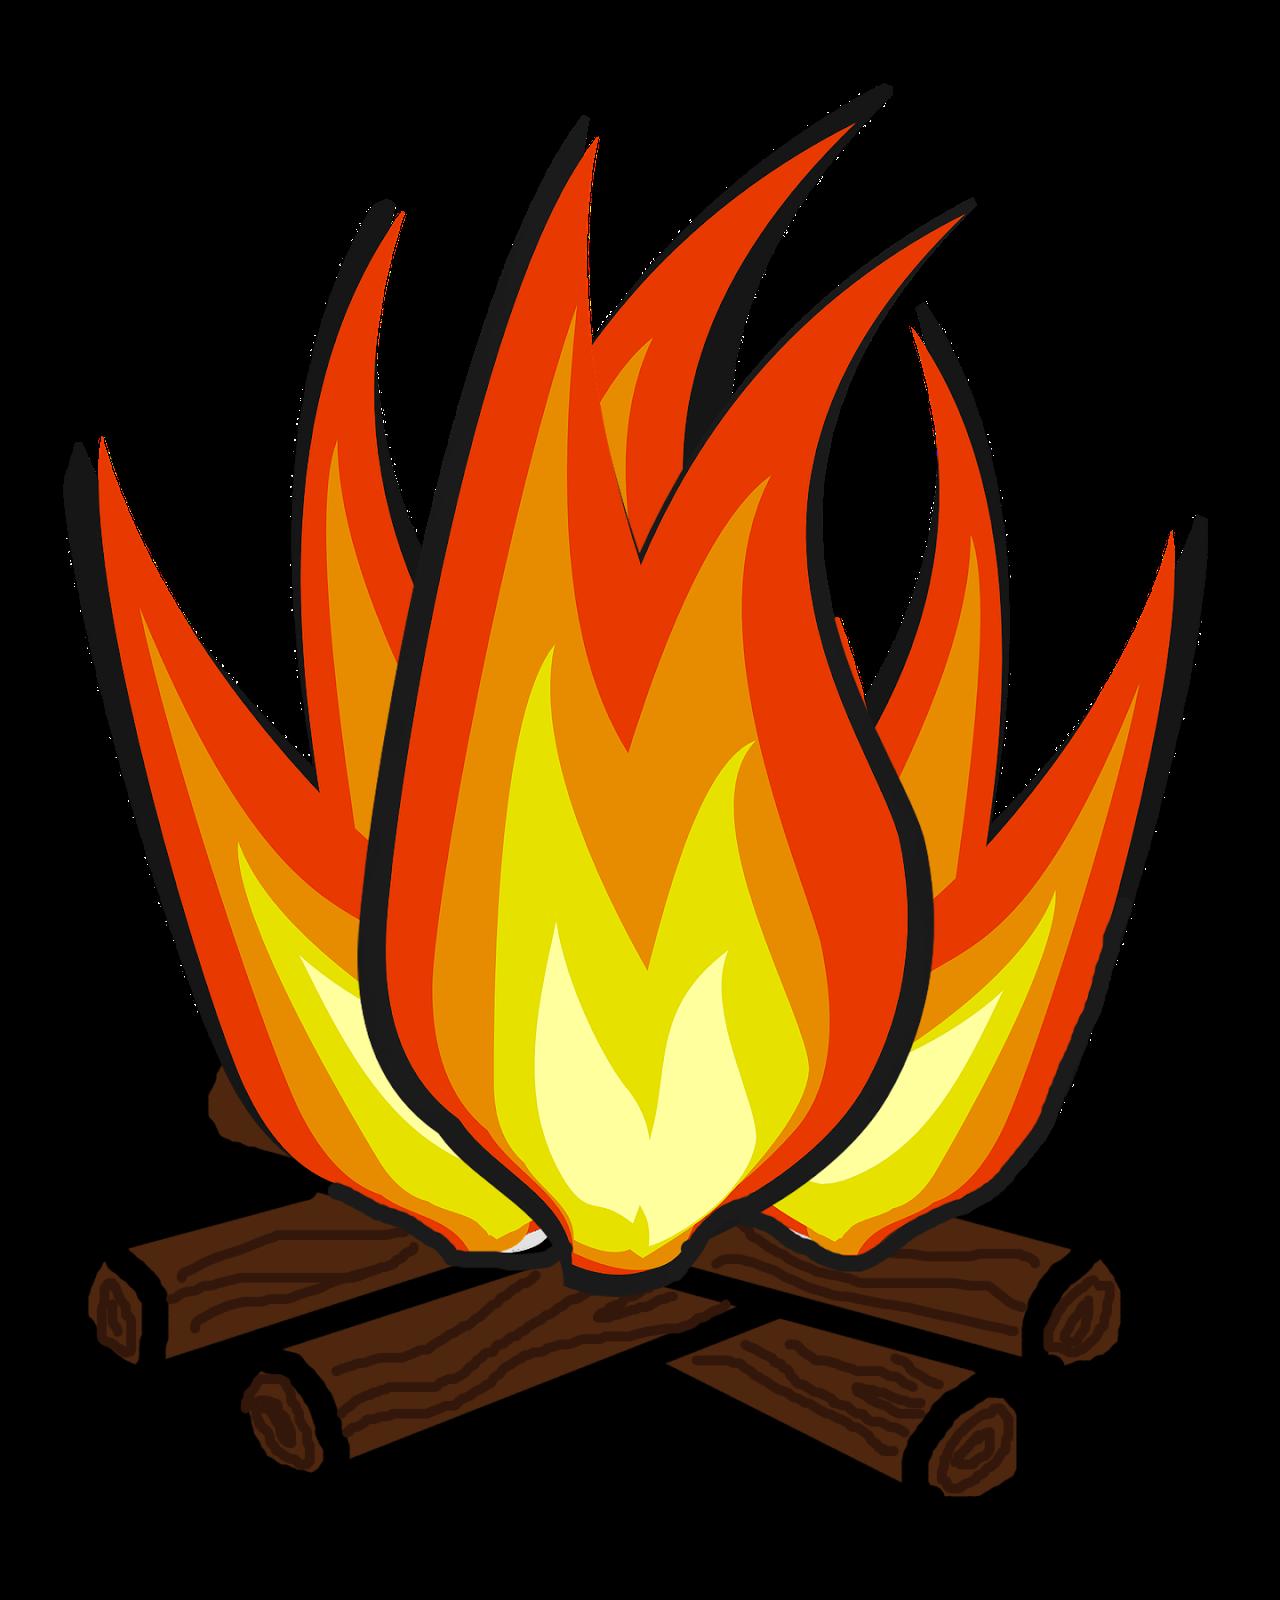 banner black and white download June explore pictures clipartix. Campfire clipart.